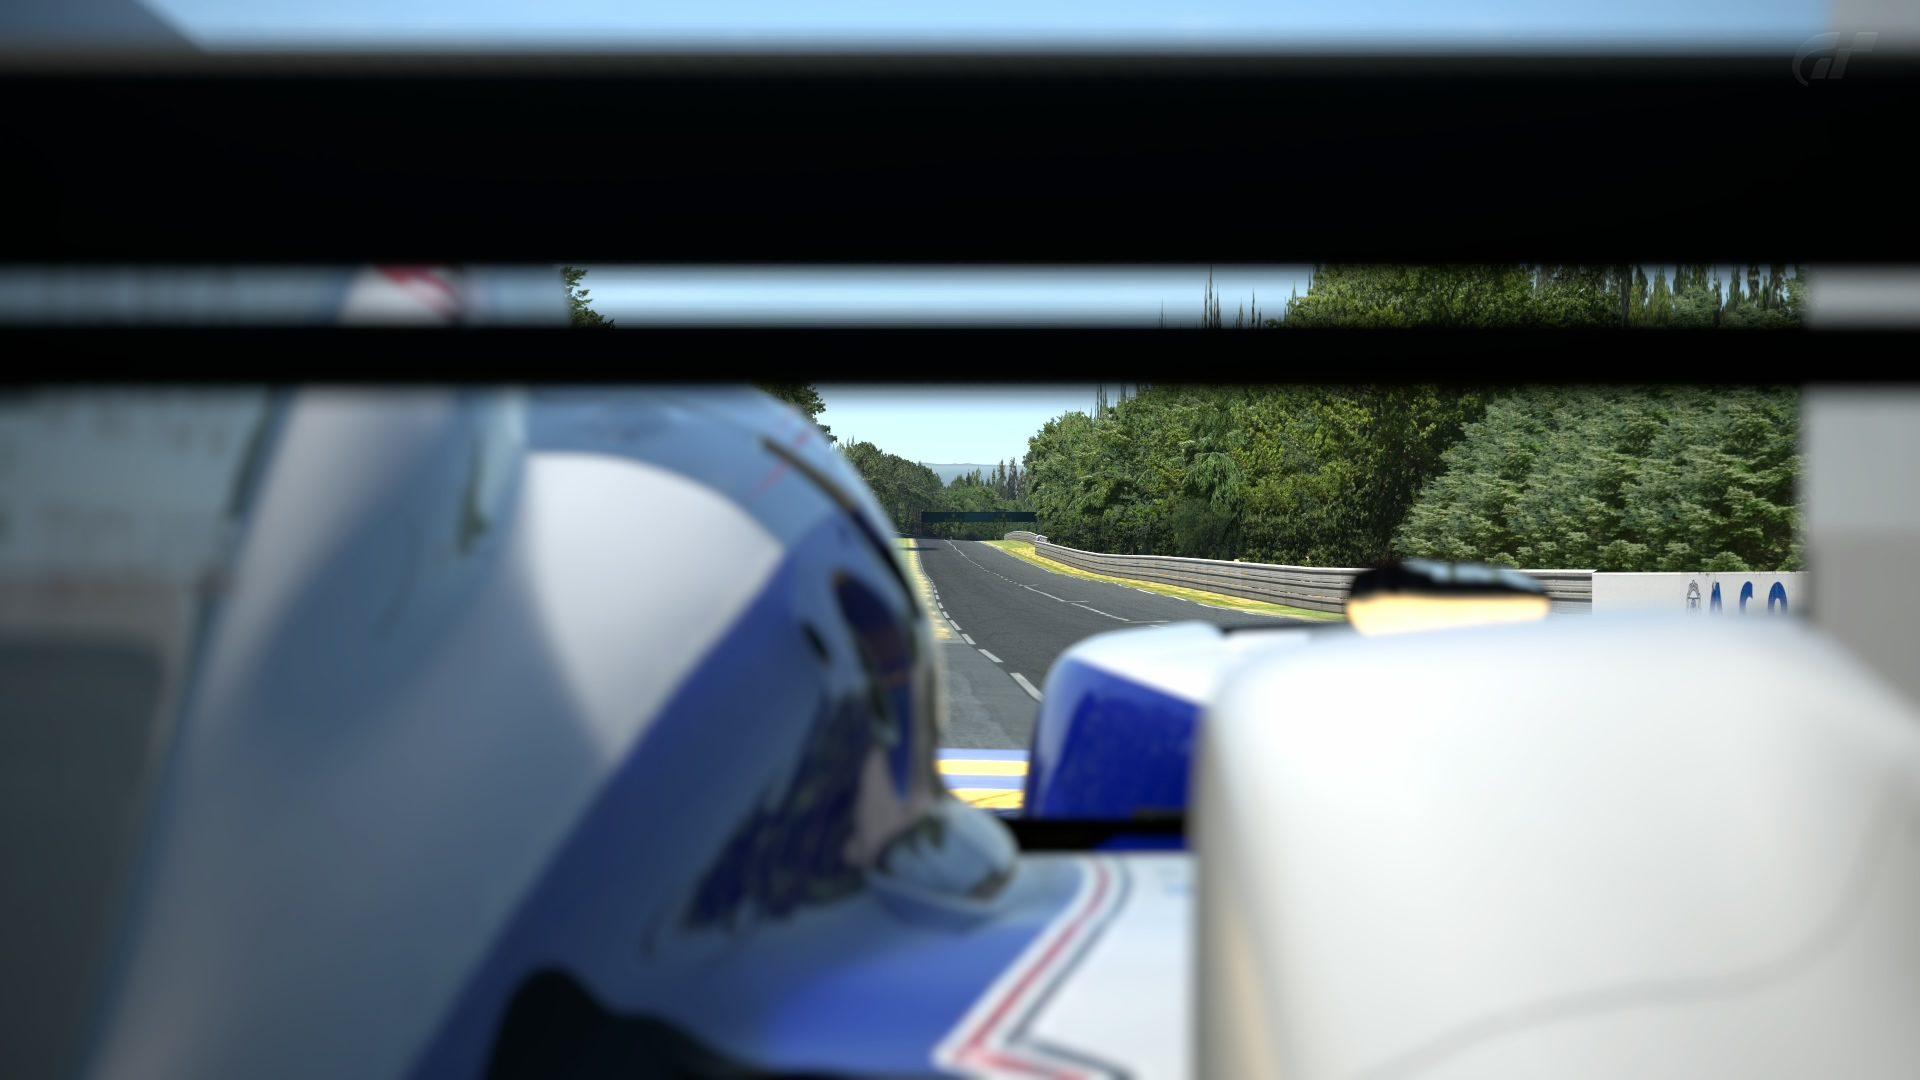 Circuit de la Sarthe 2013_4 (2).jpg